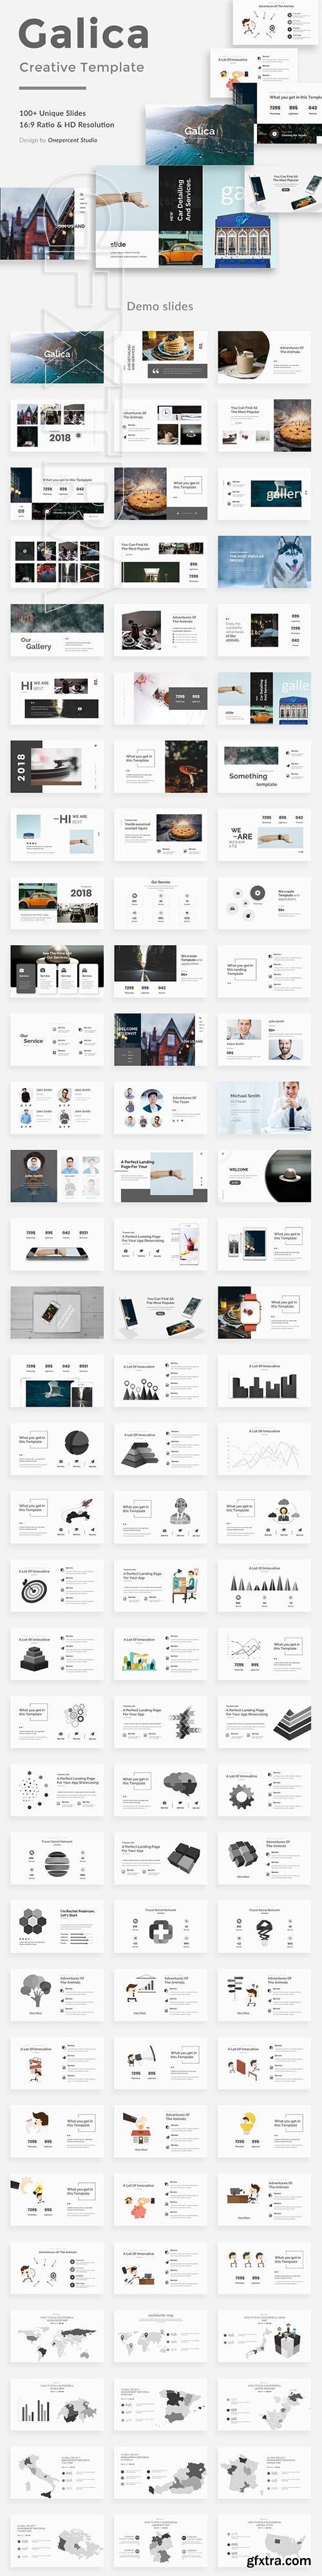 CreativeMarket - Galica Creative Powerpoint Template 2681752